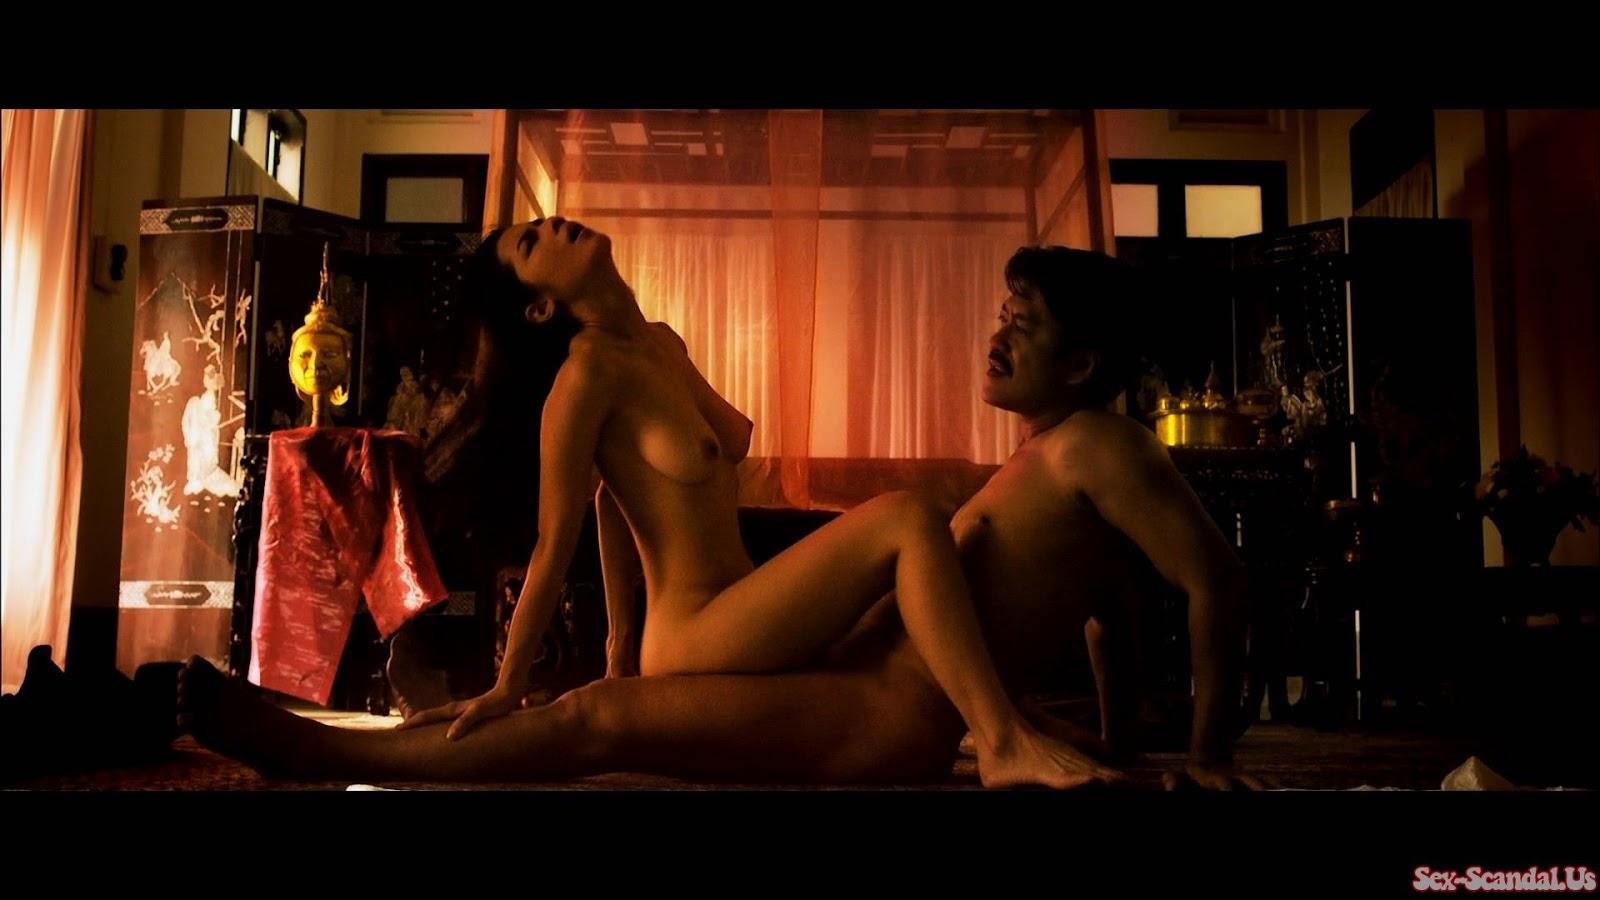 yayaying rhatha phongam nude